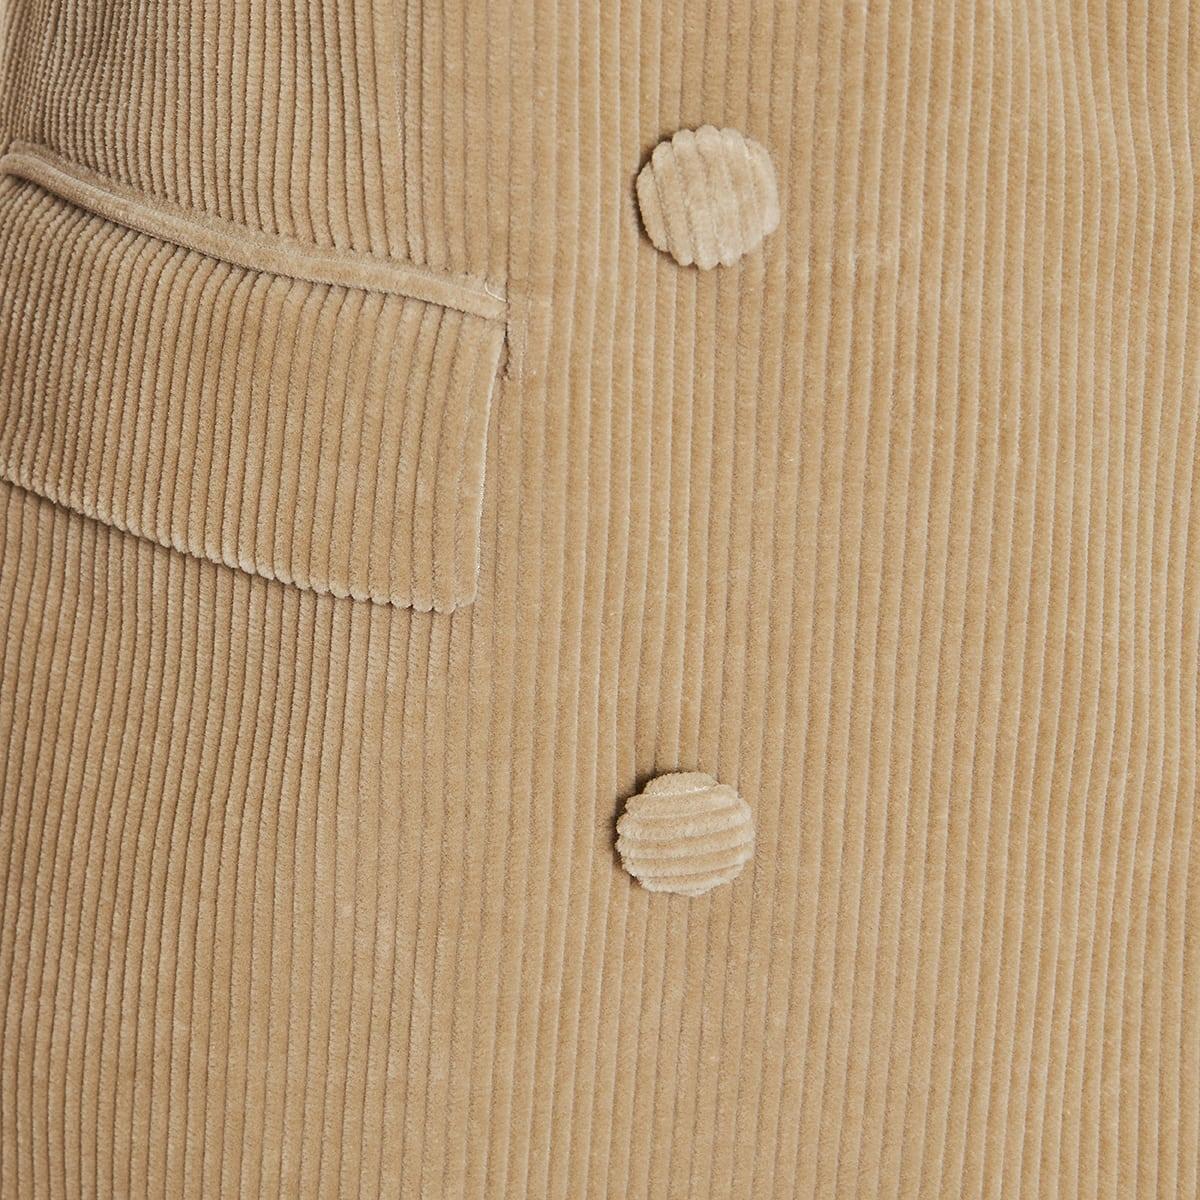 Double-breasted corduroy blazer